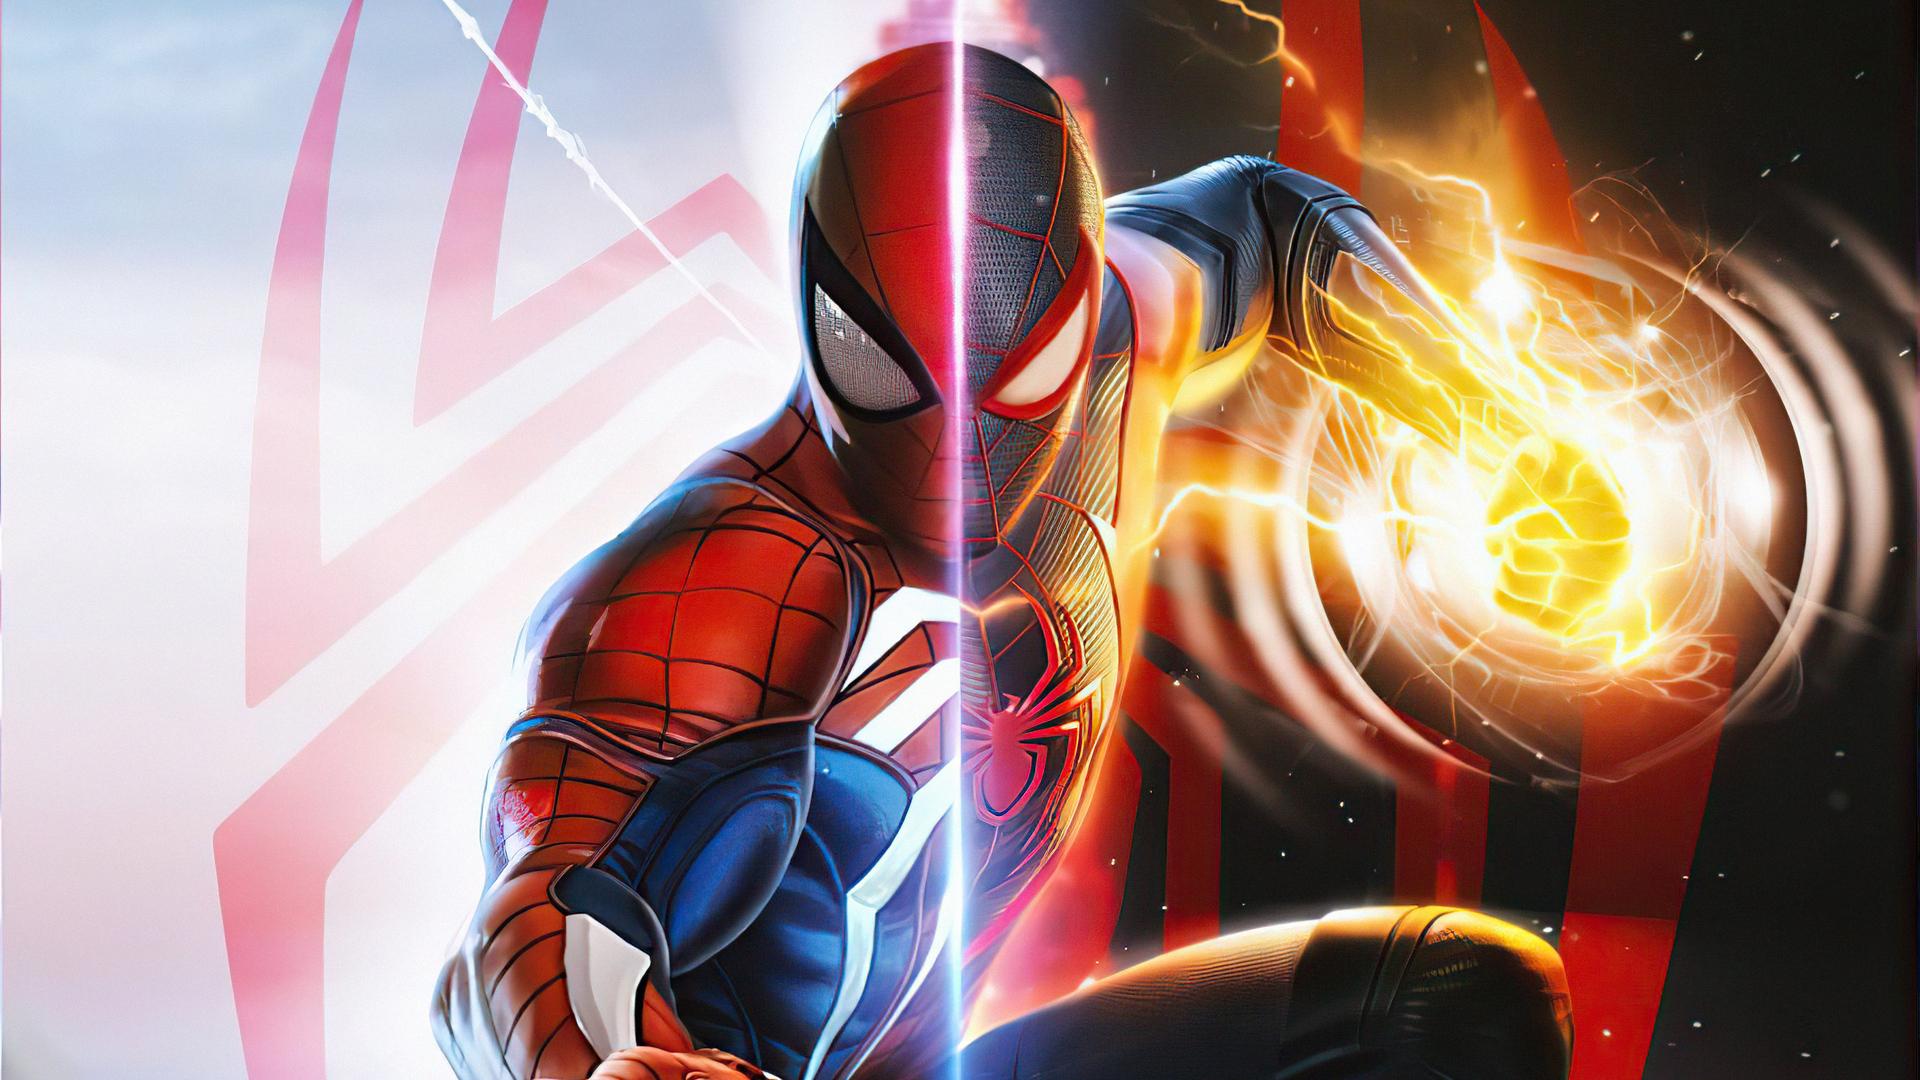 spiderman-miles-morales-fanart-4k-99.jpg